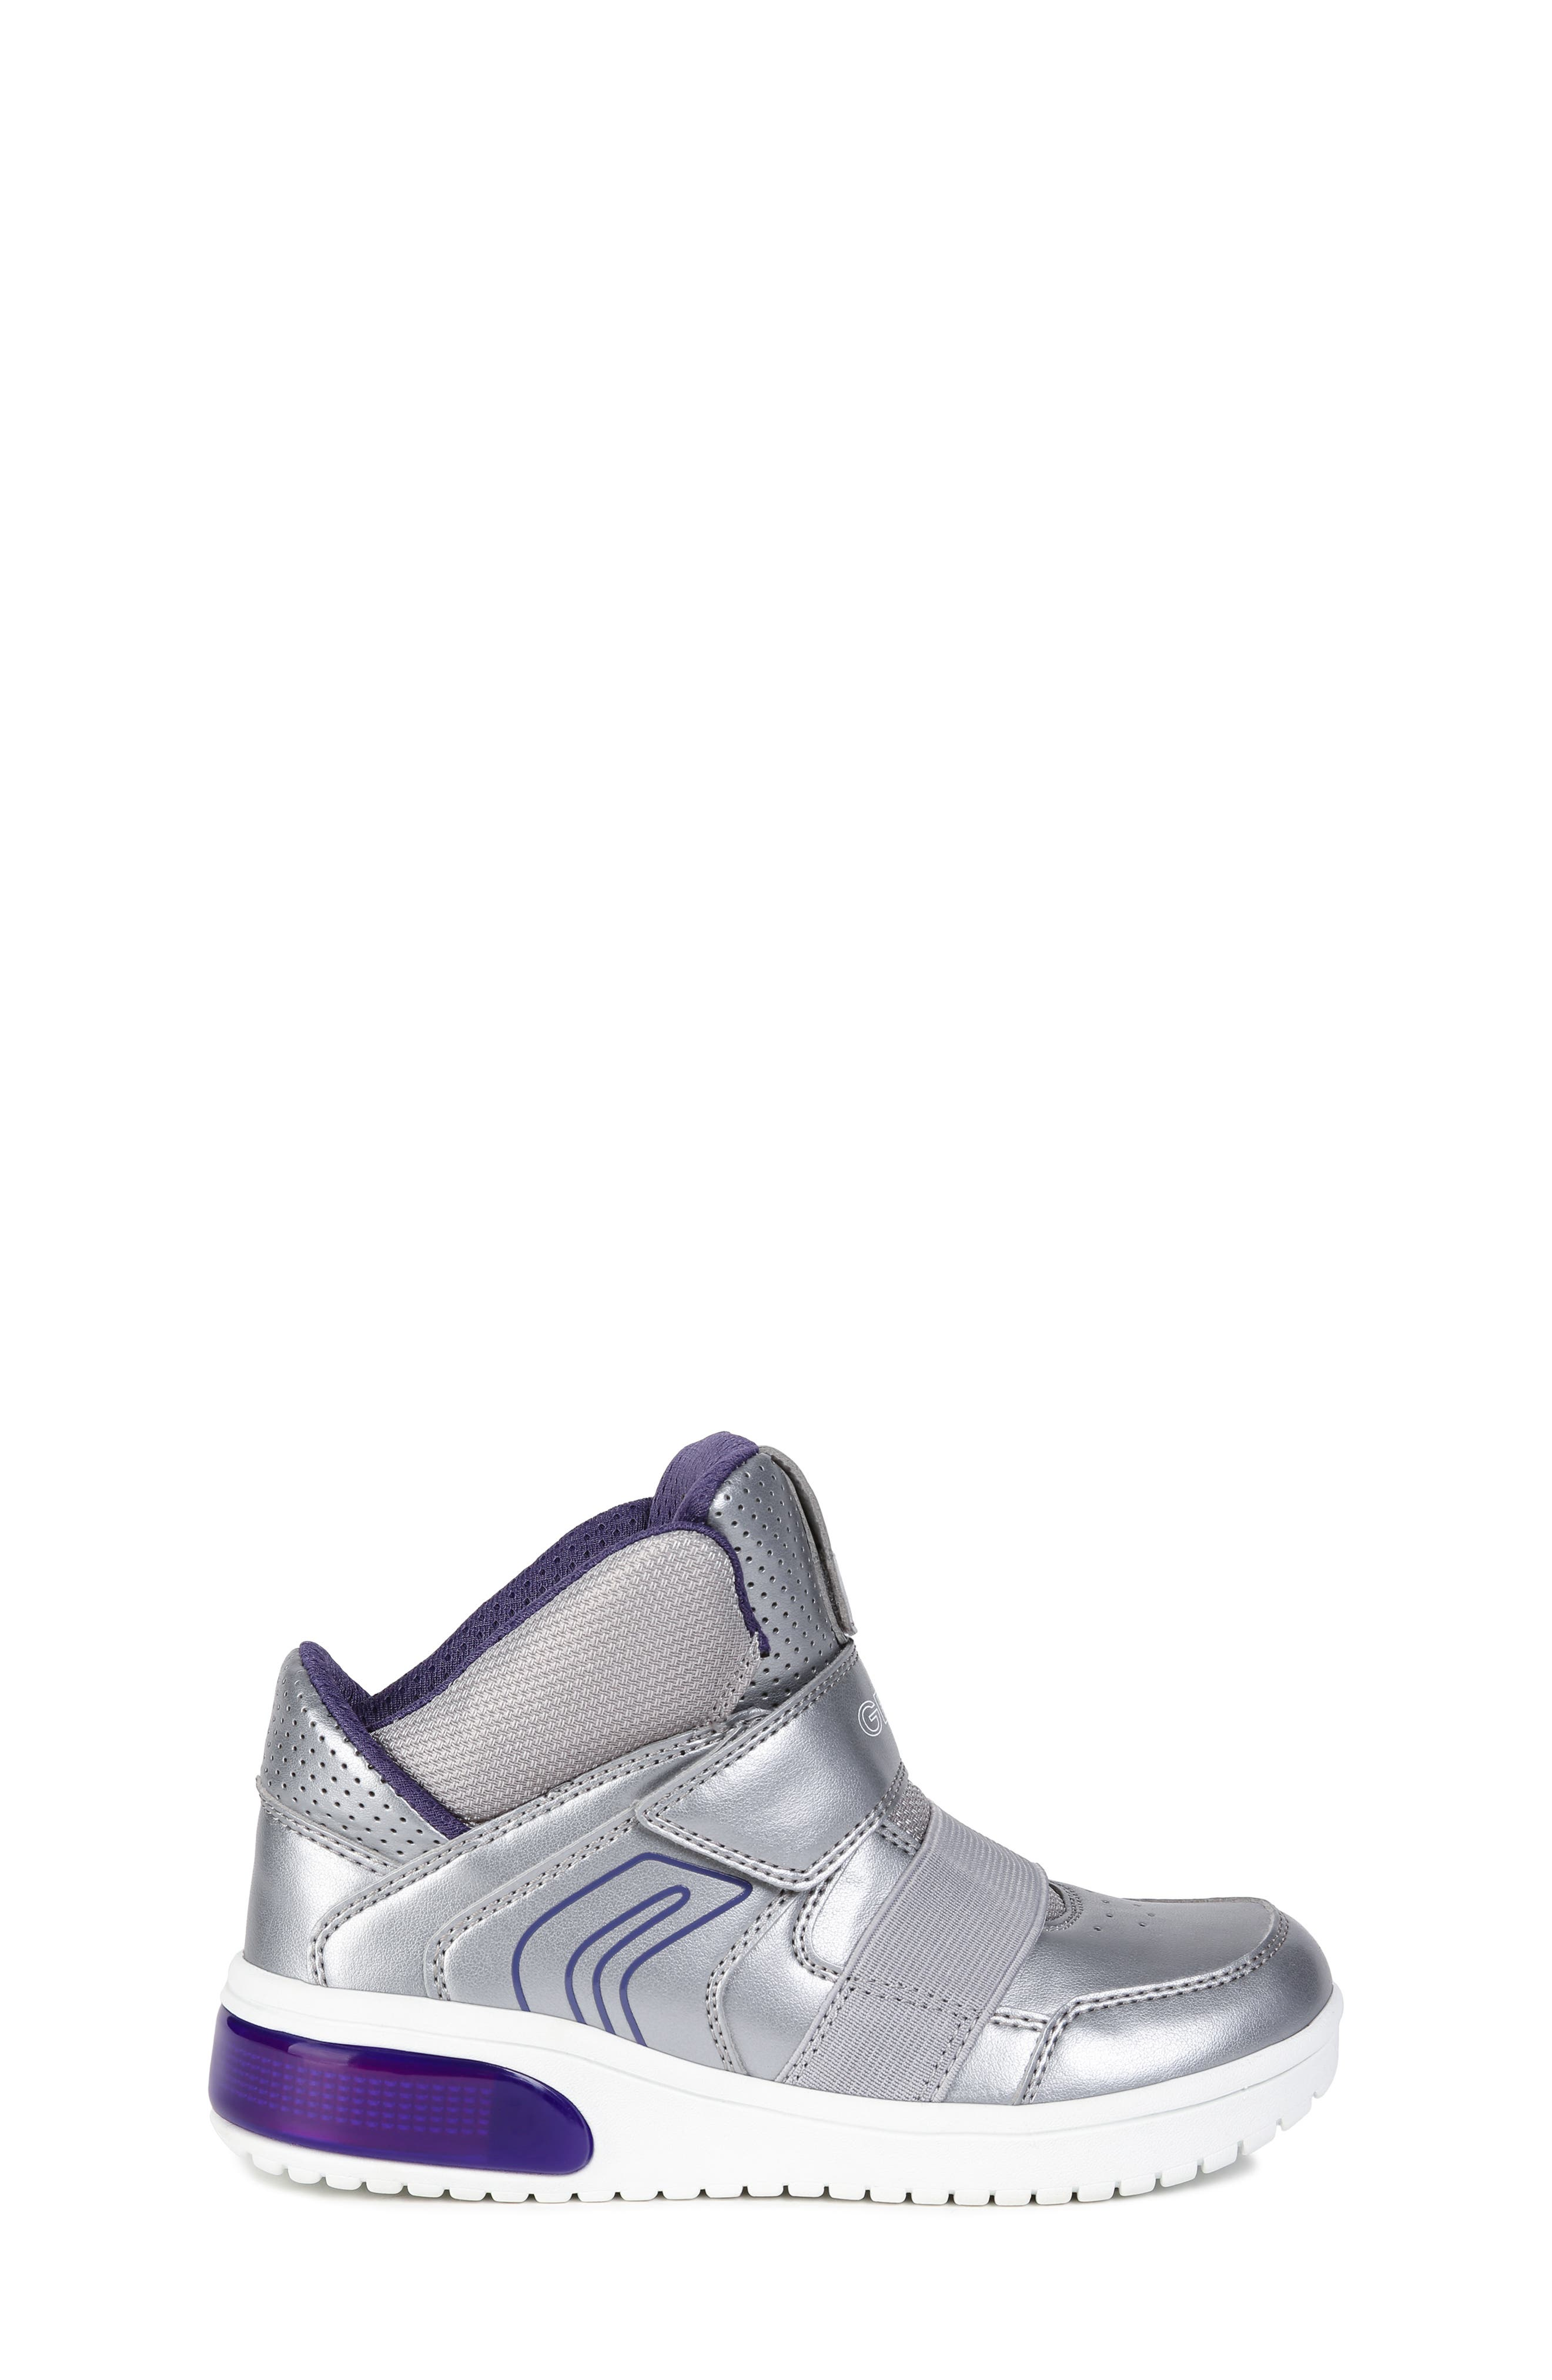 Xled Light Up Sneaker,                             Alternate thumbnail 3, color,                             SILVER/ VIOLET